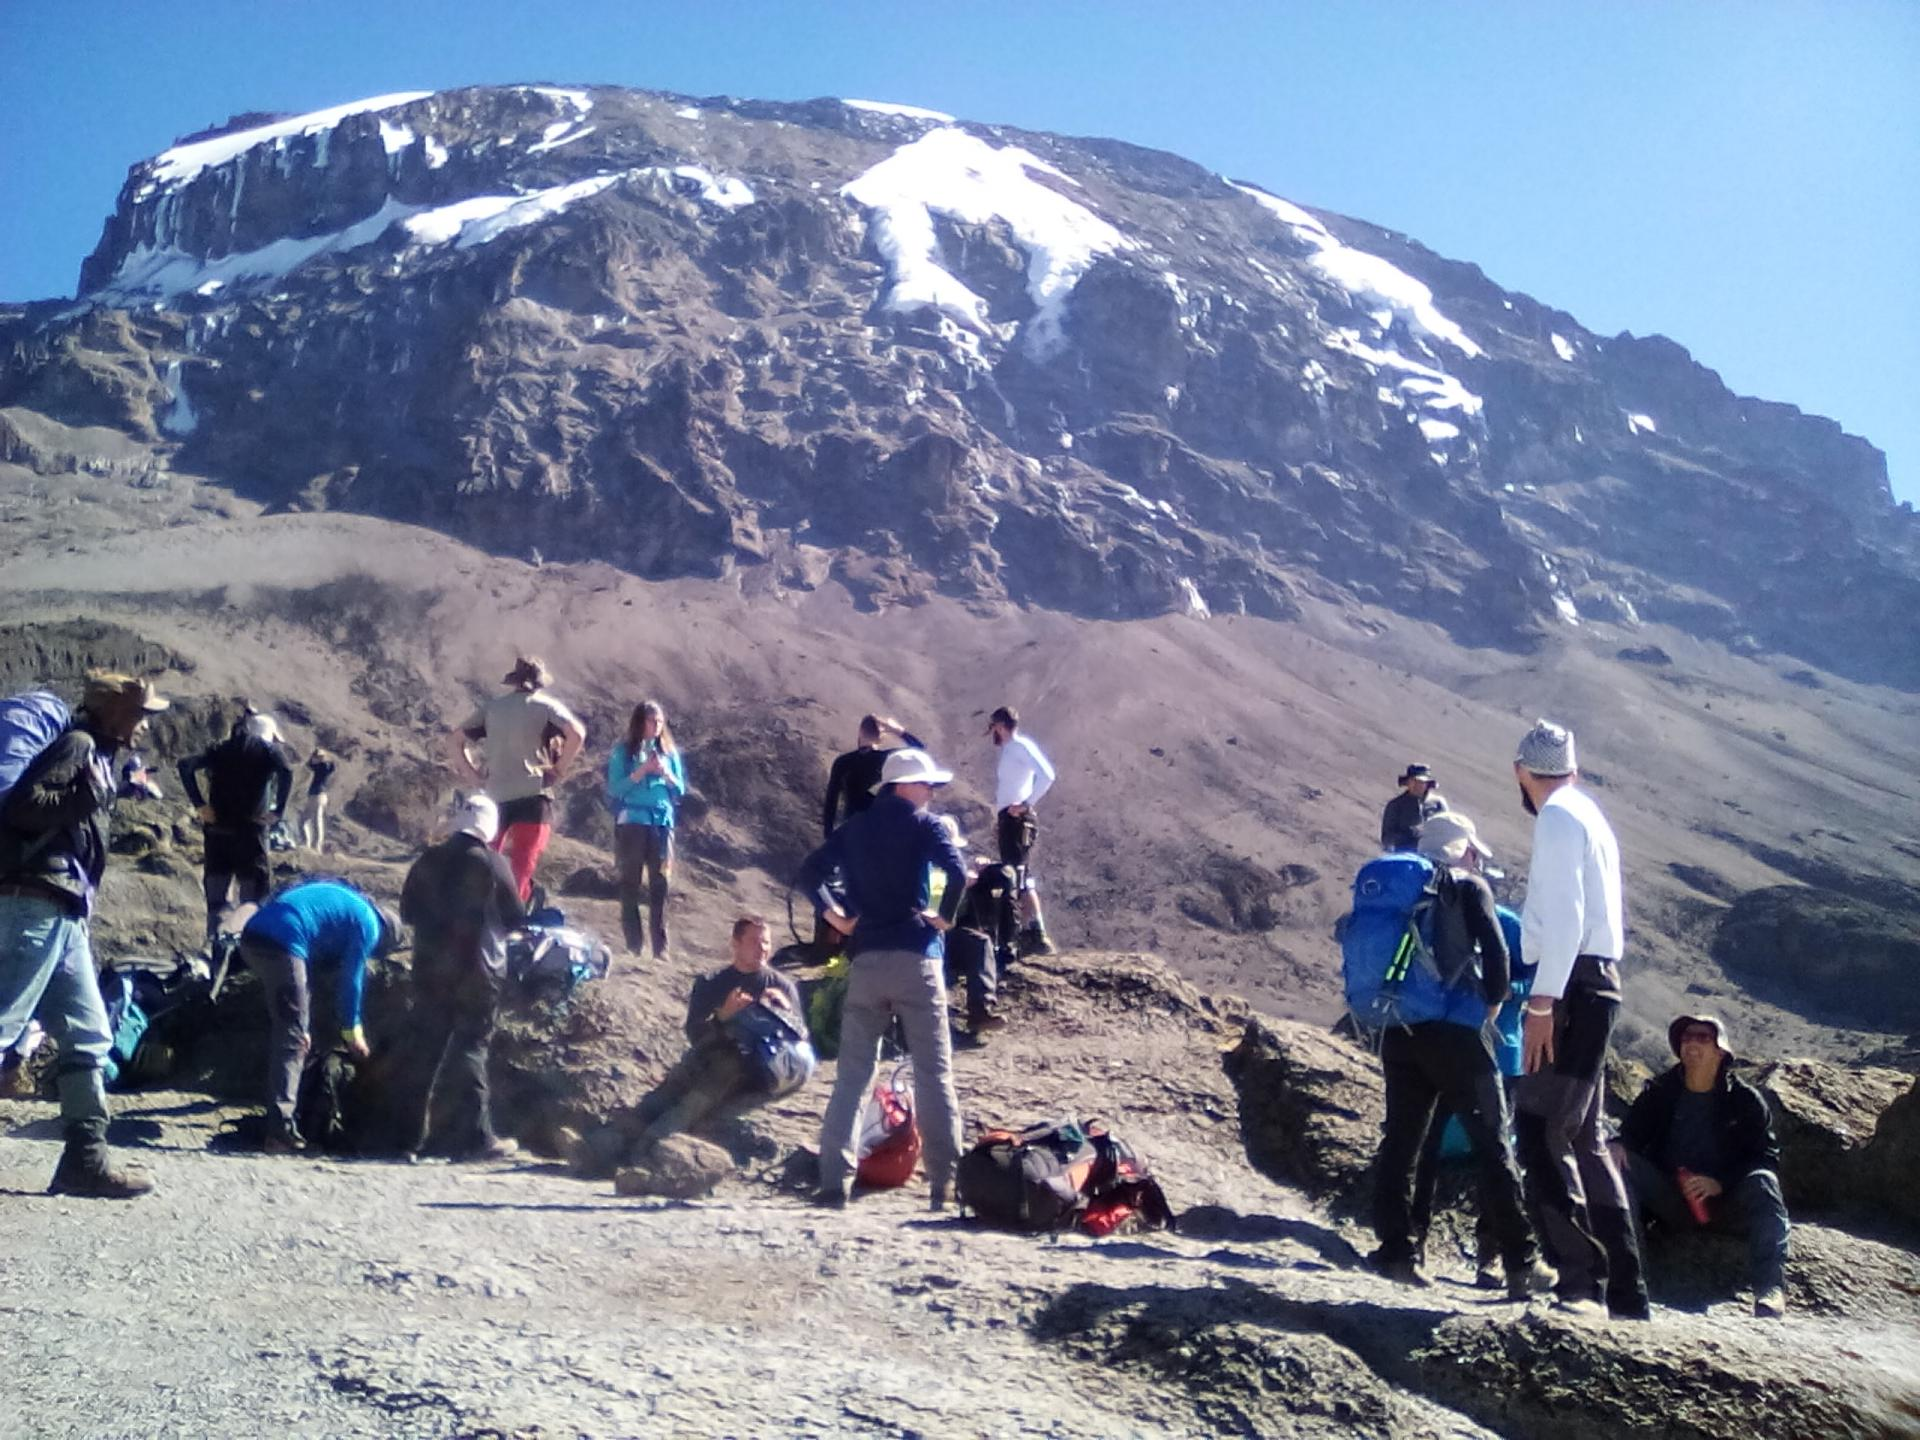 Climb Kilimanjaro,climbing mount Kilimanjaro,Kilimanjaro